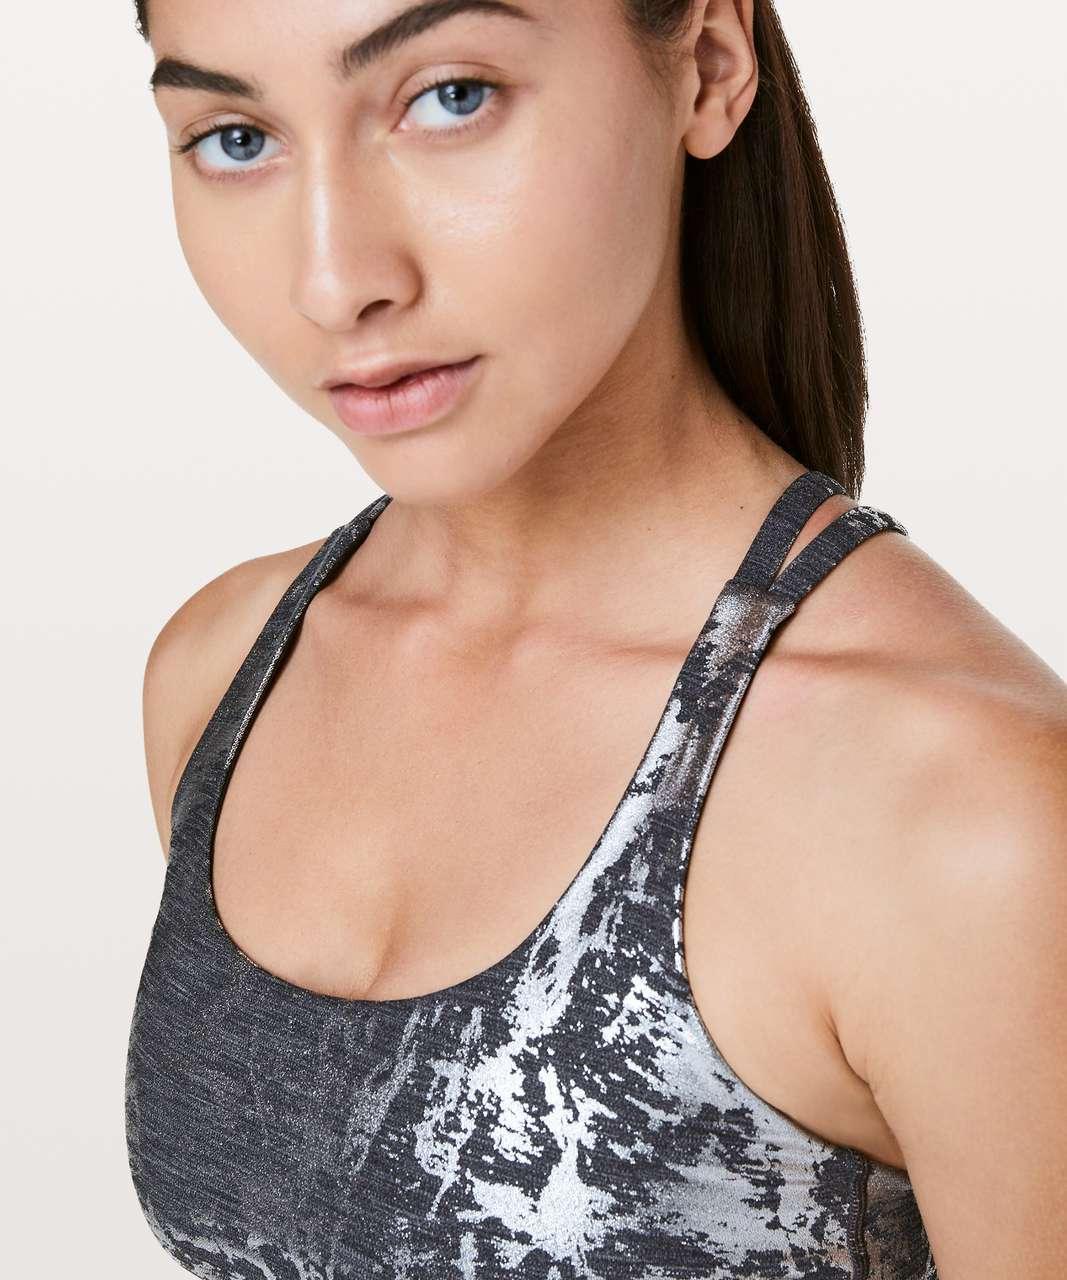 Lululemon Energy Bra - Crinkle Heather Brindle High Shine Foil